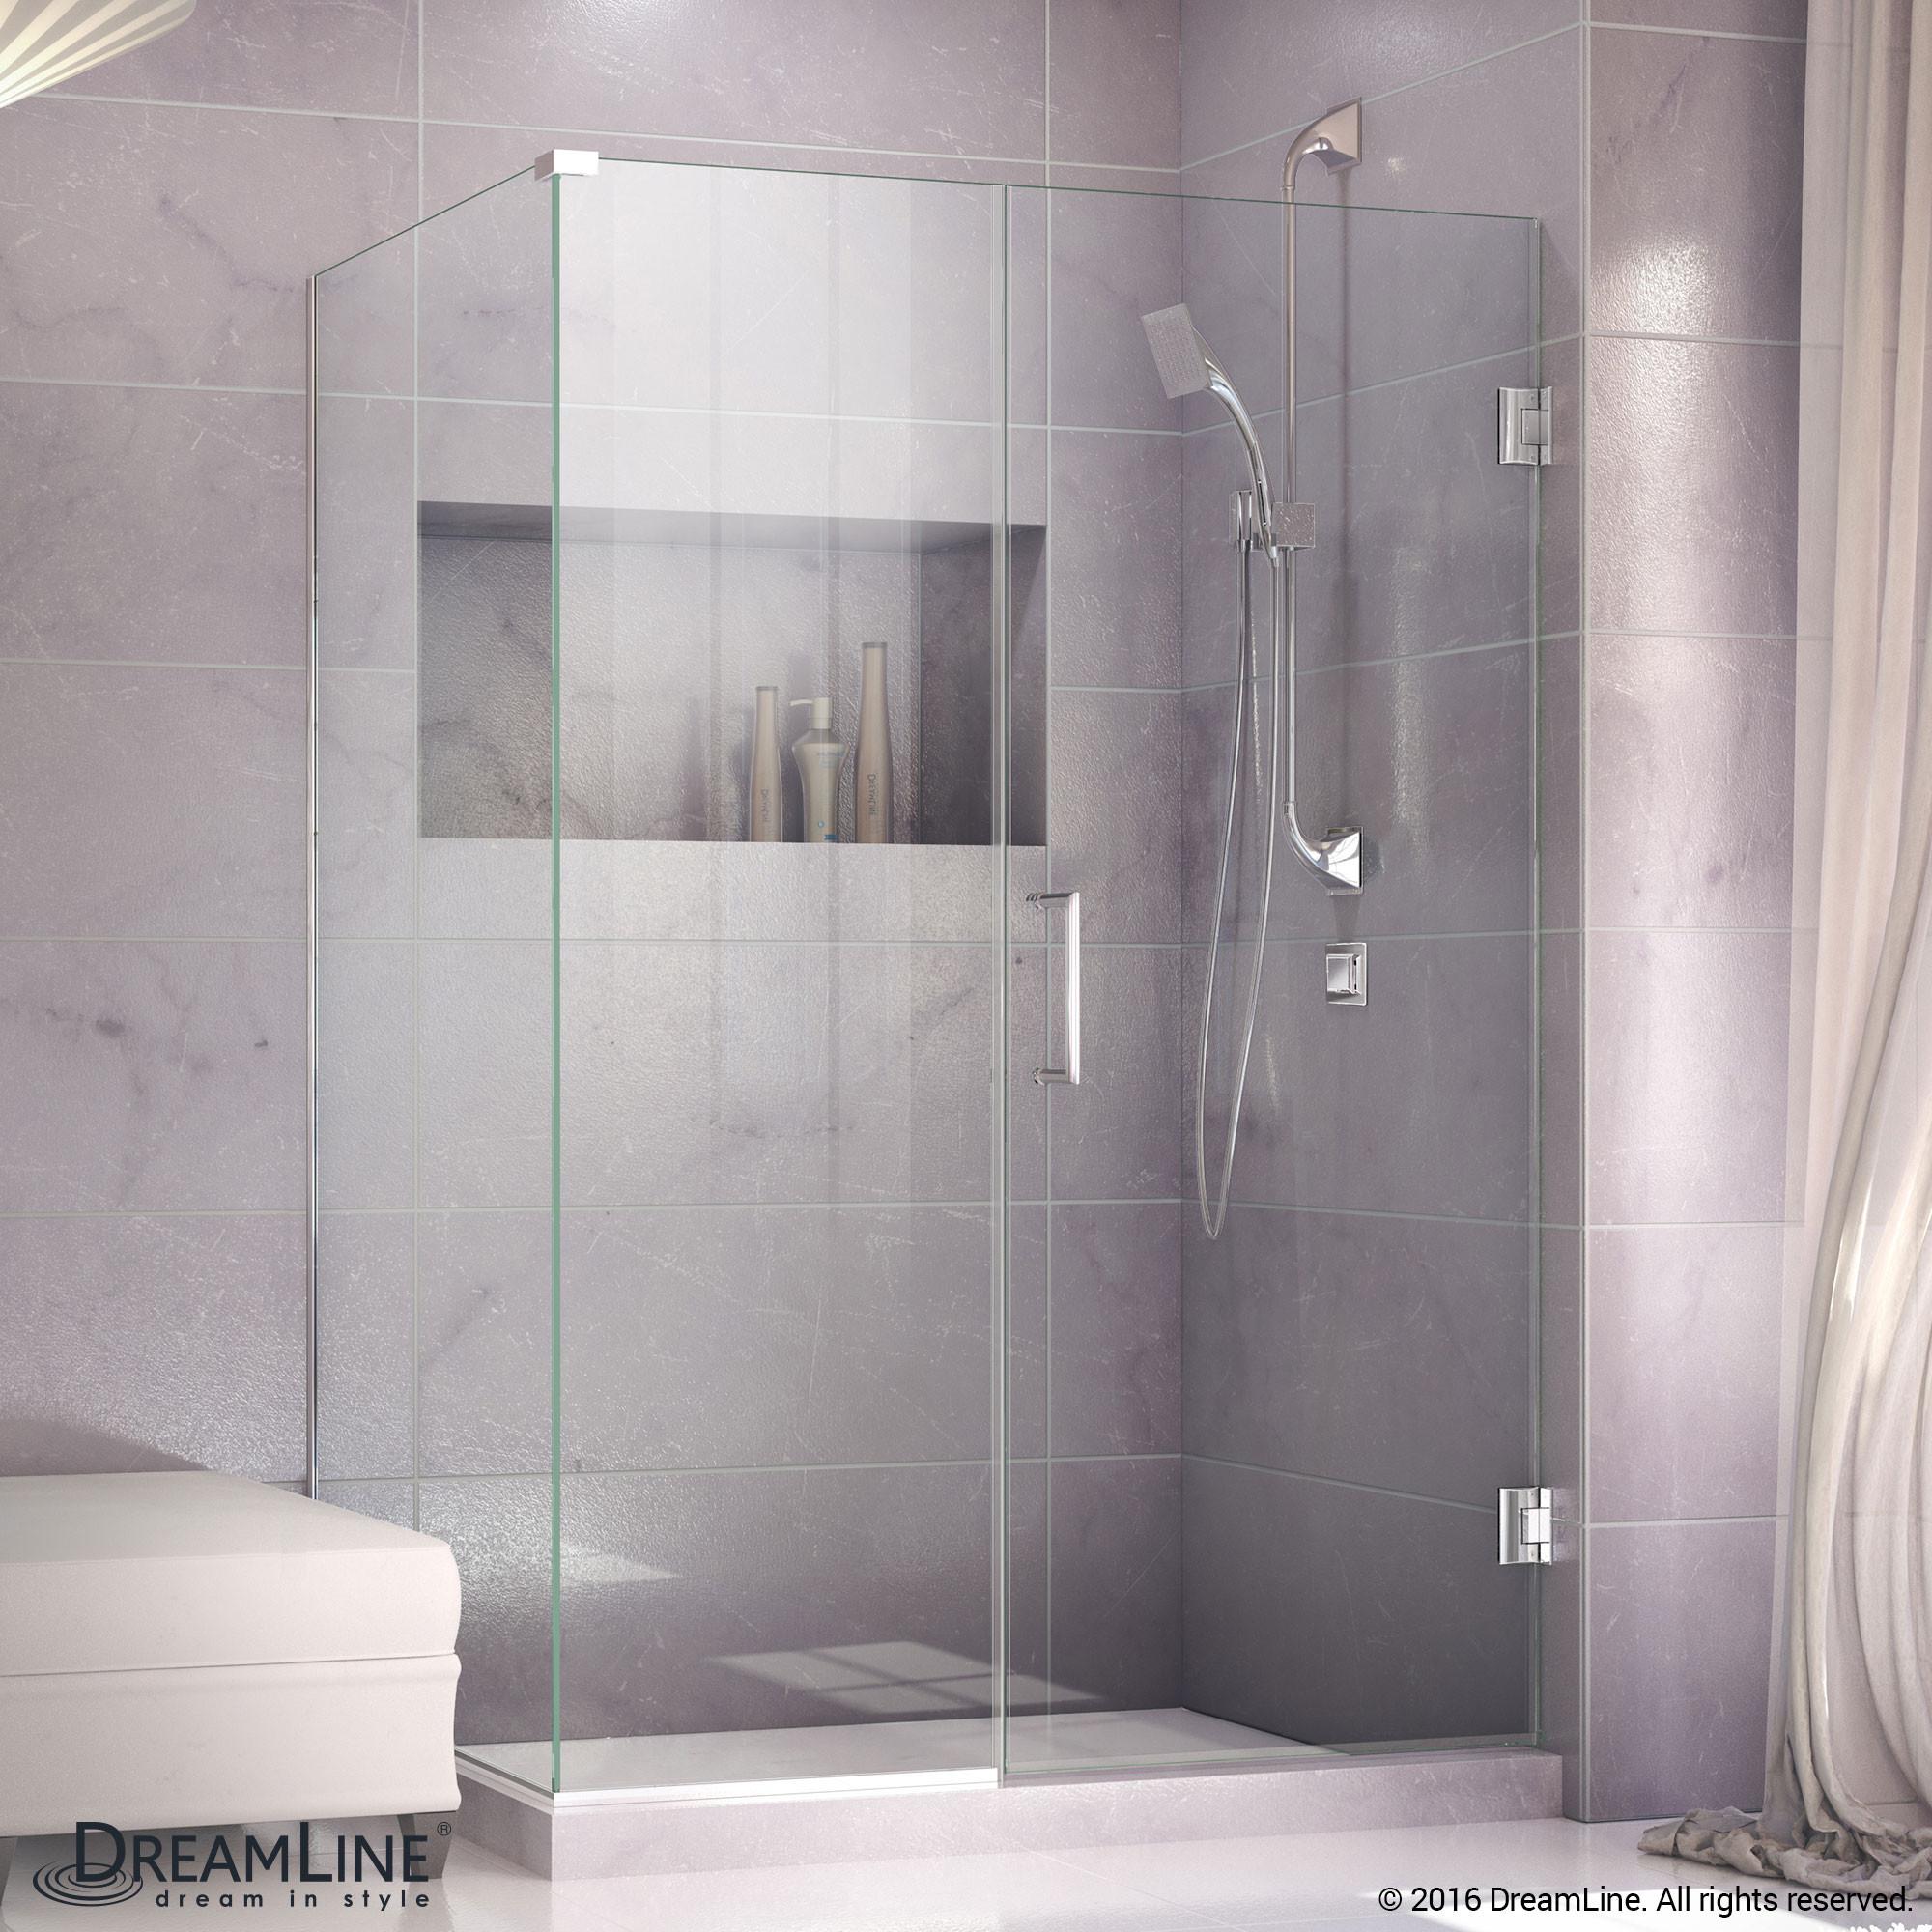 DreamLine SHEN-24430300-01 Unidoor Plus Hinged Shower Enclosure In Chrome Finish Hardware